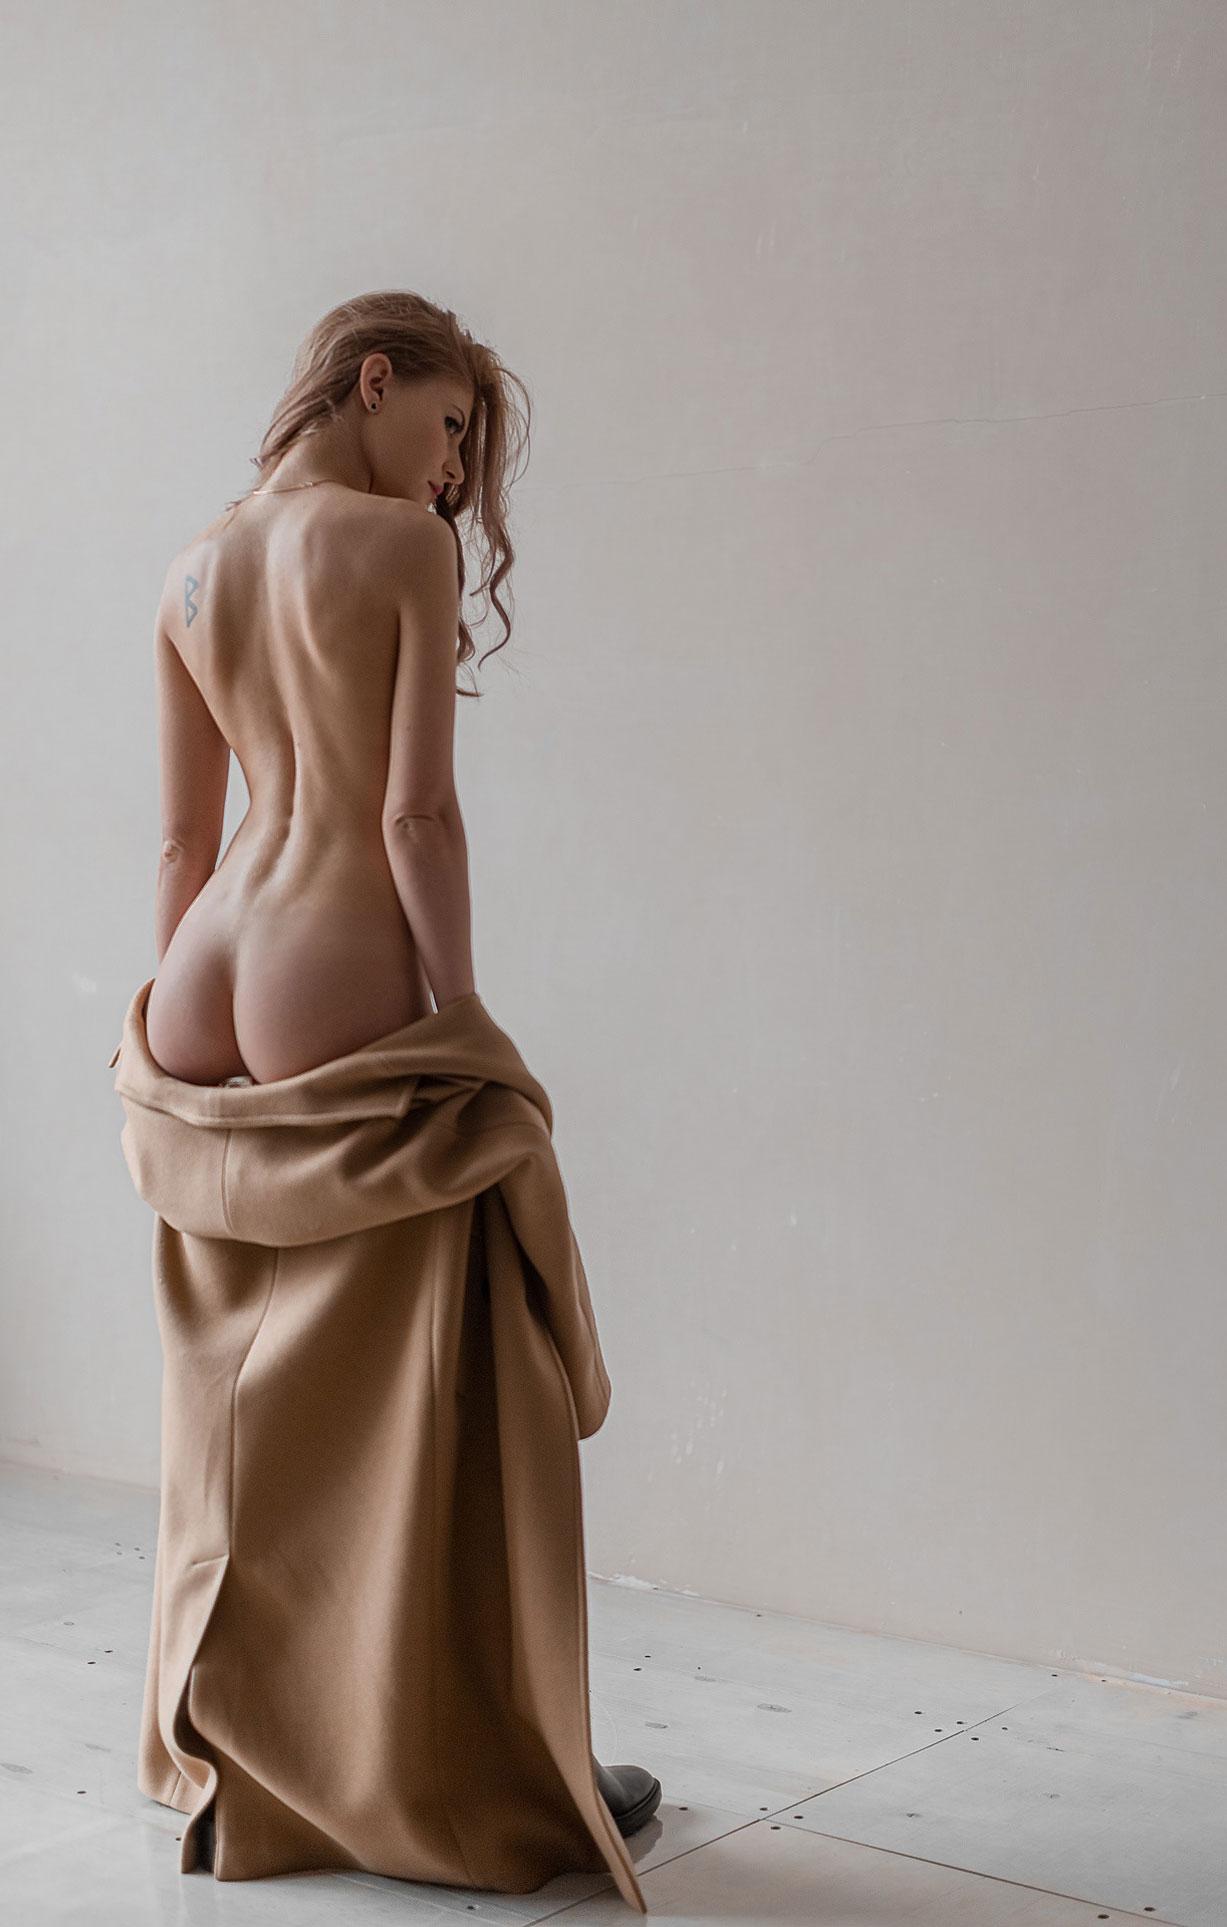 Тэш в сапогах и пальто на голое тело / фото 05